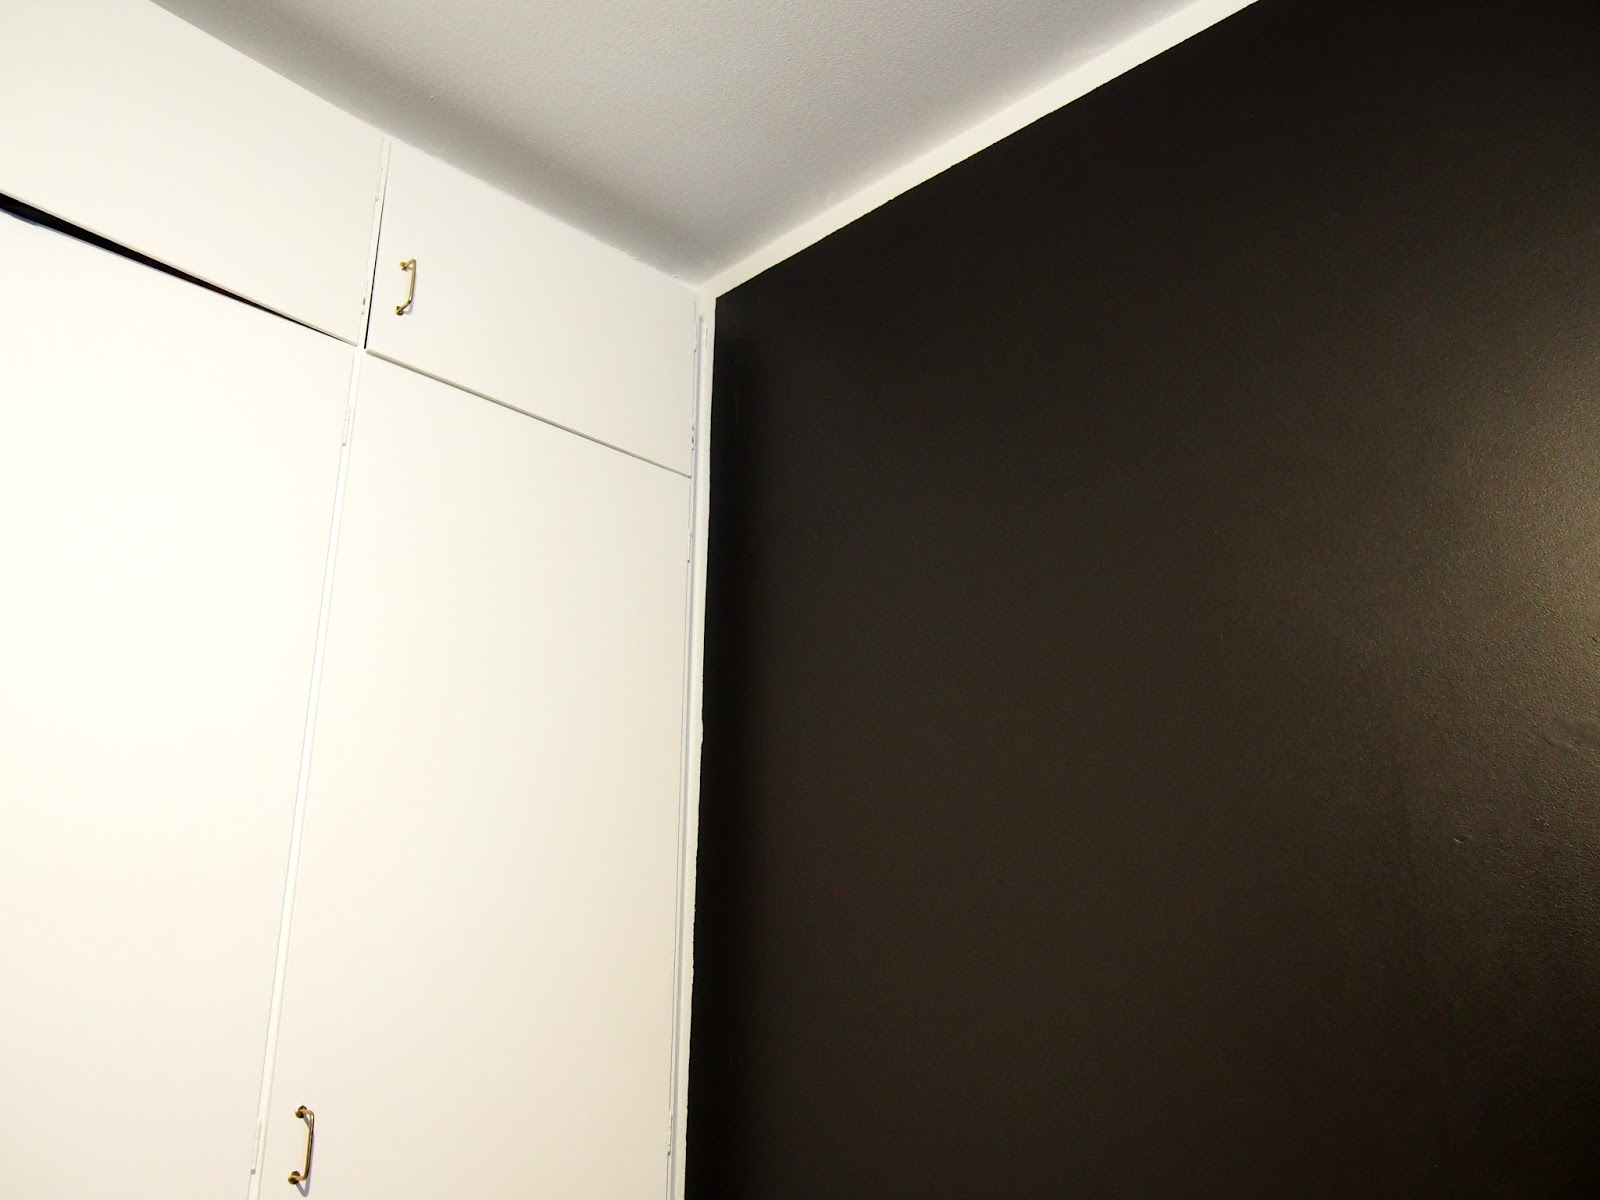 musta valkoinen kontrasti black white kaappi uusi pintaremontti remontti